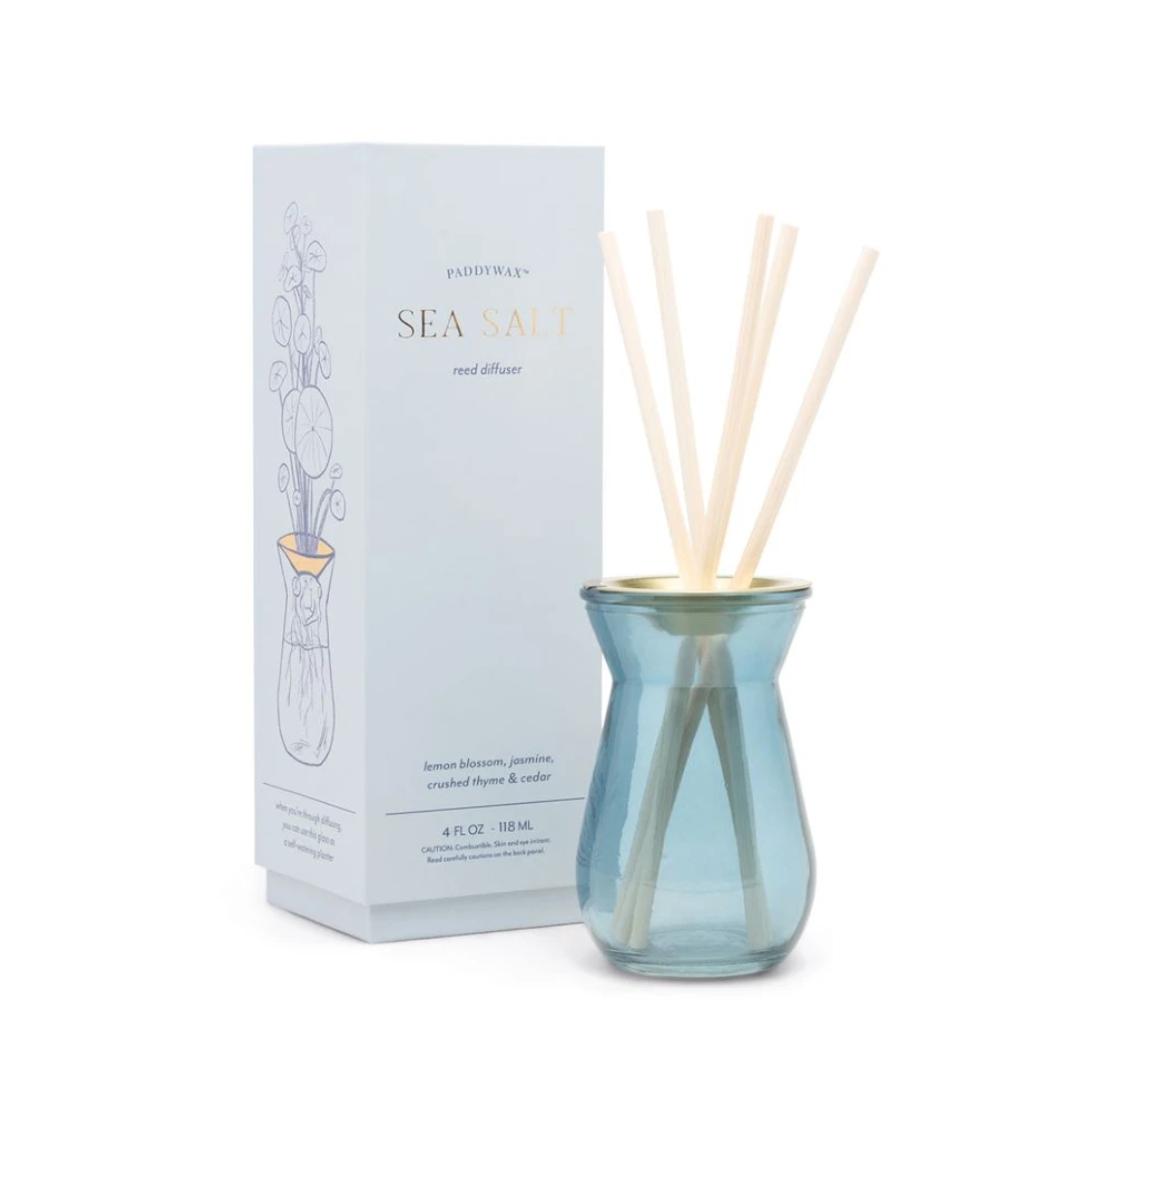 PADDYWAX Flora Diffuser-Sea Salt